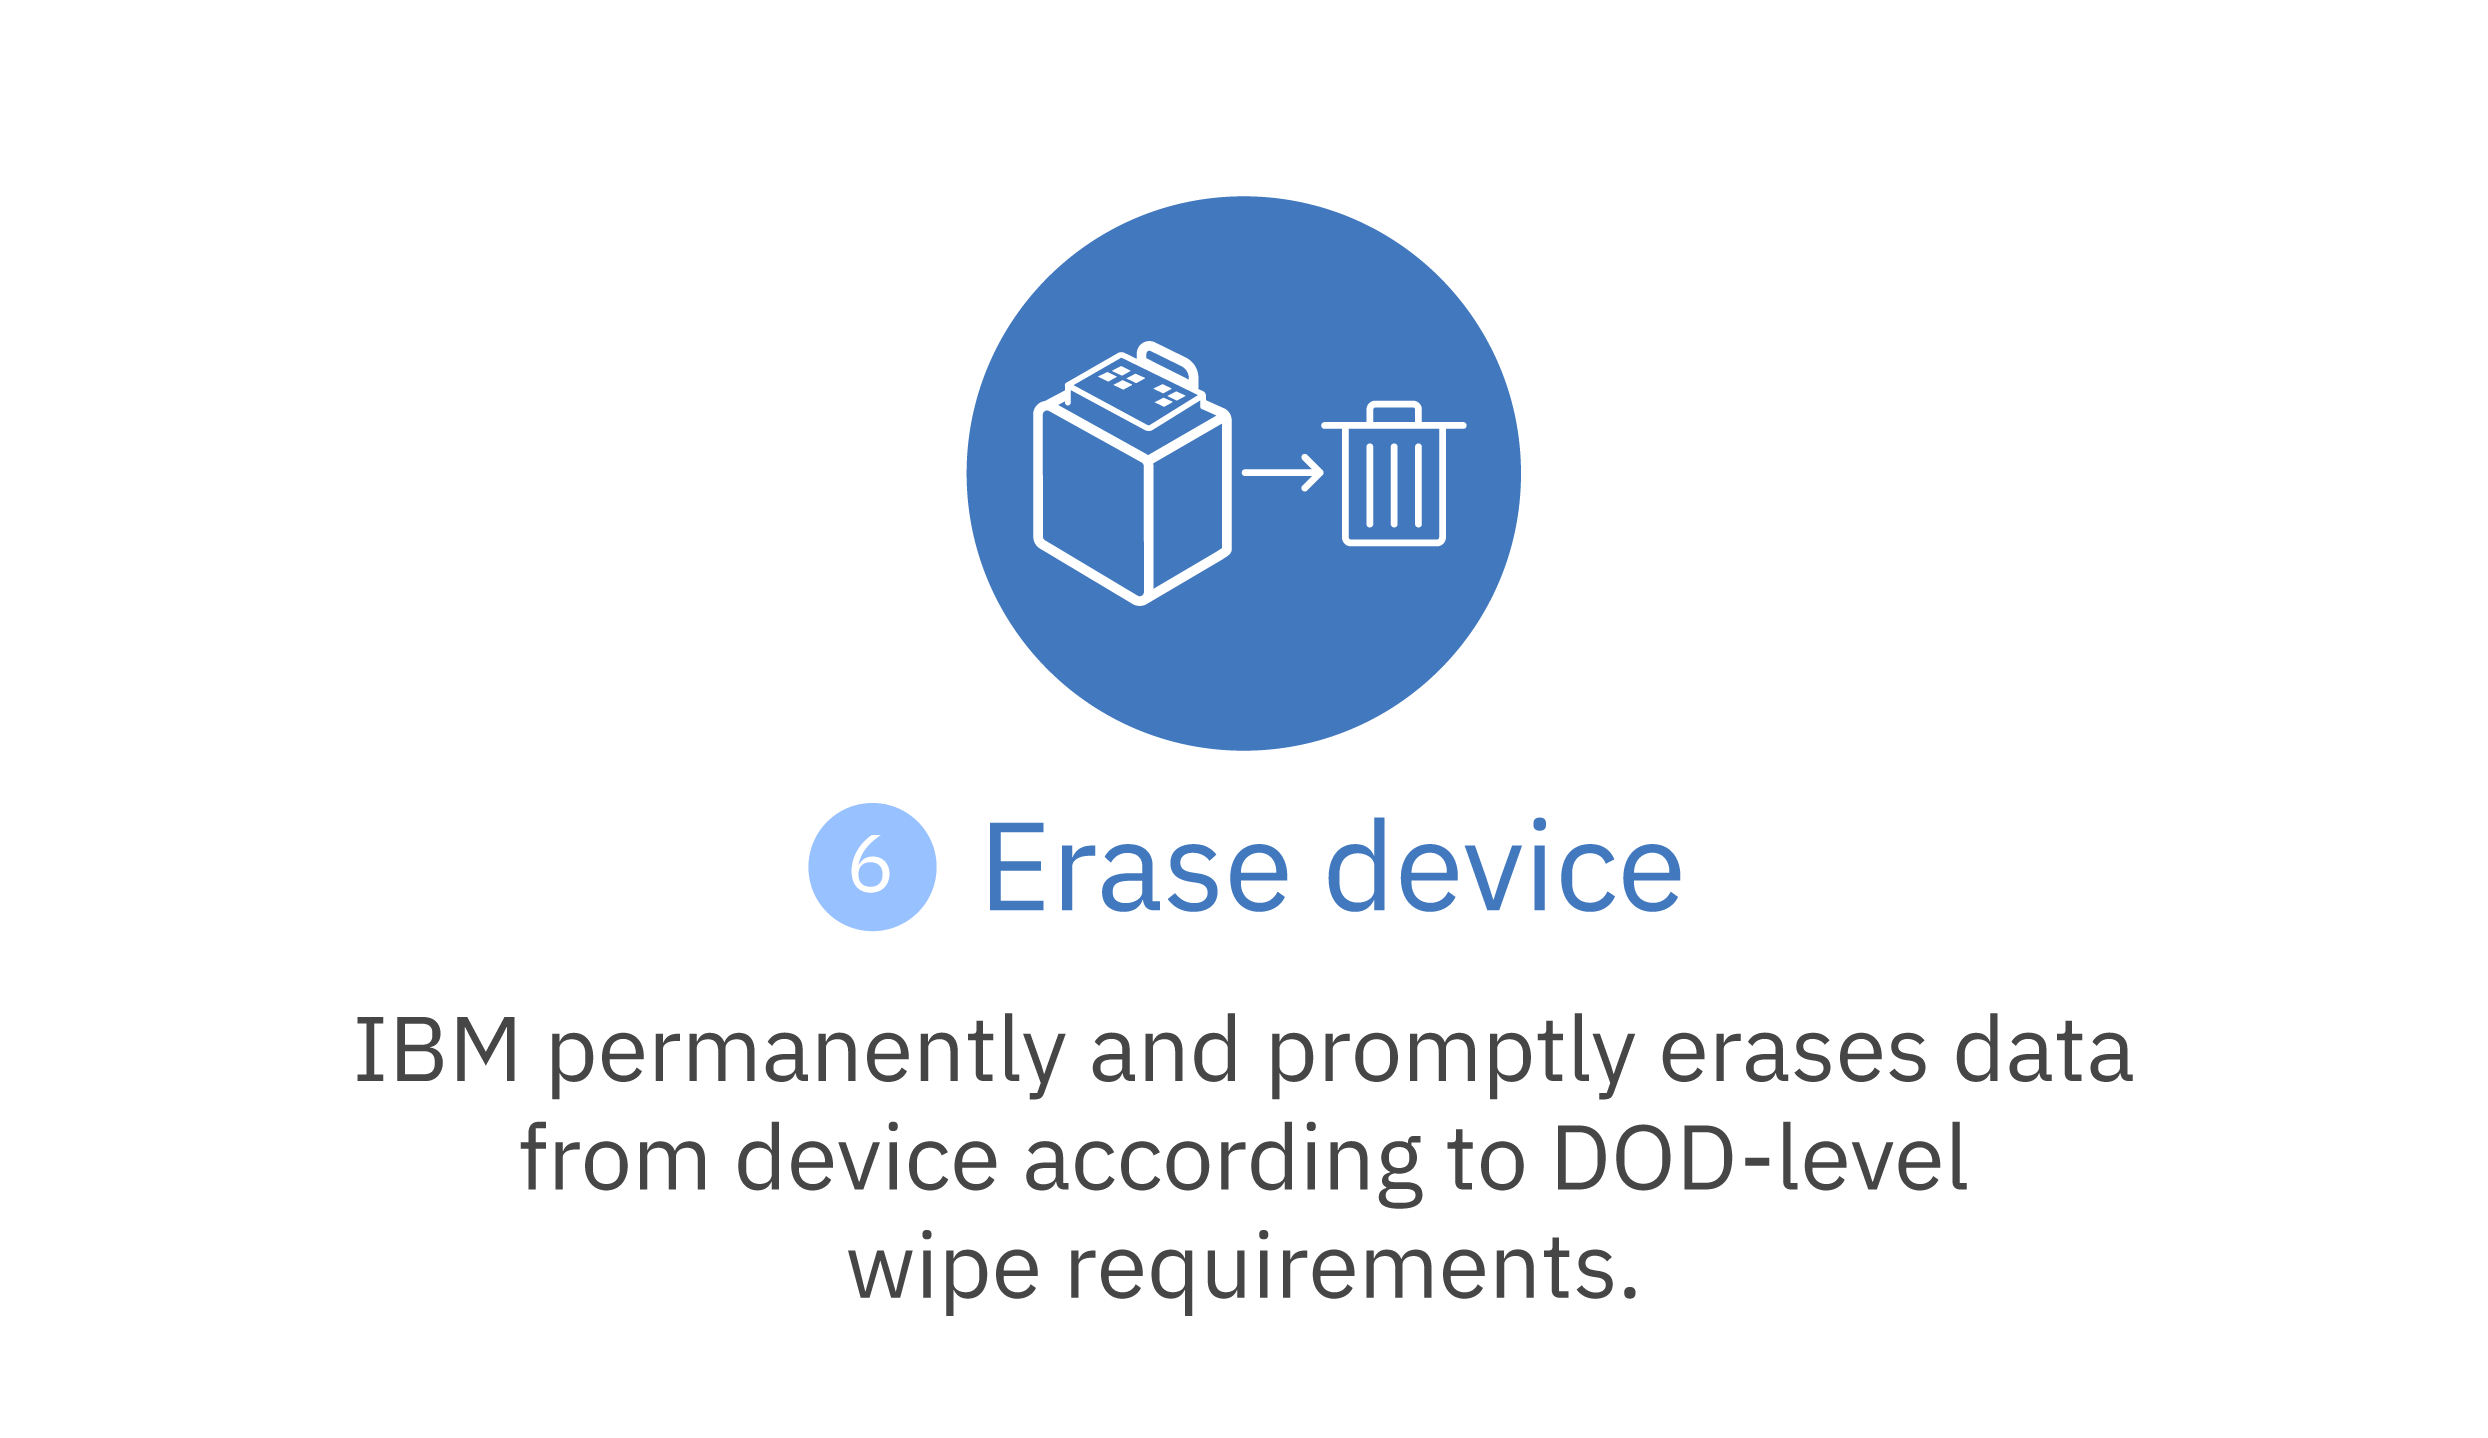 Step 6: Erase device